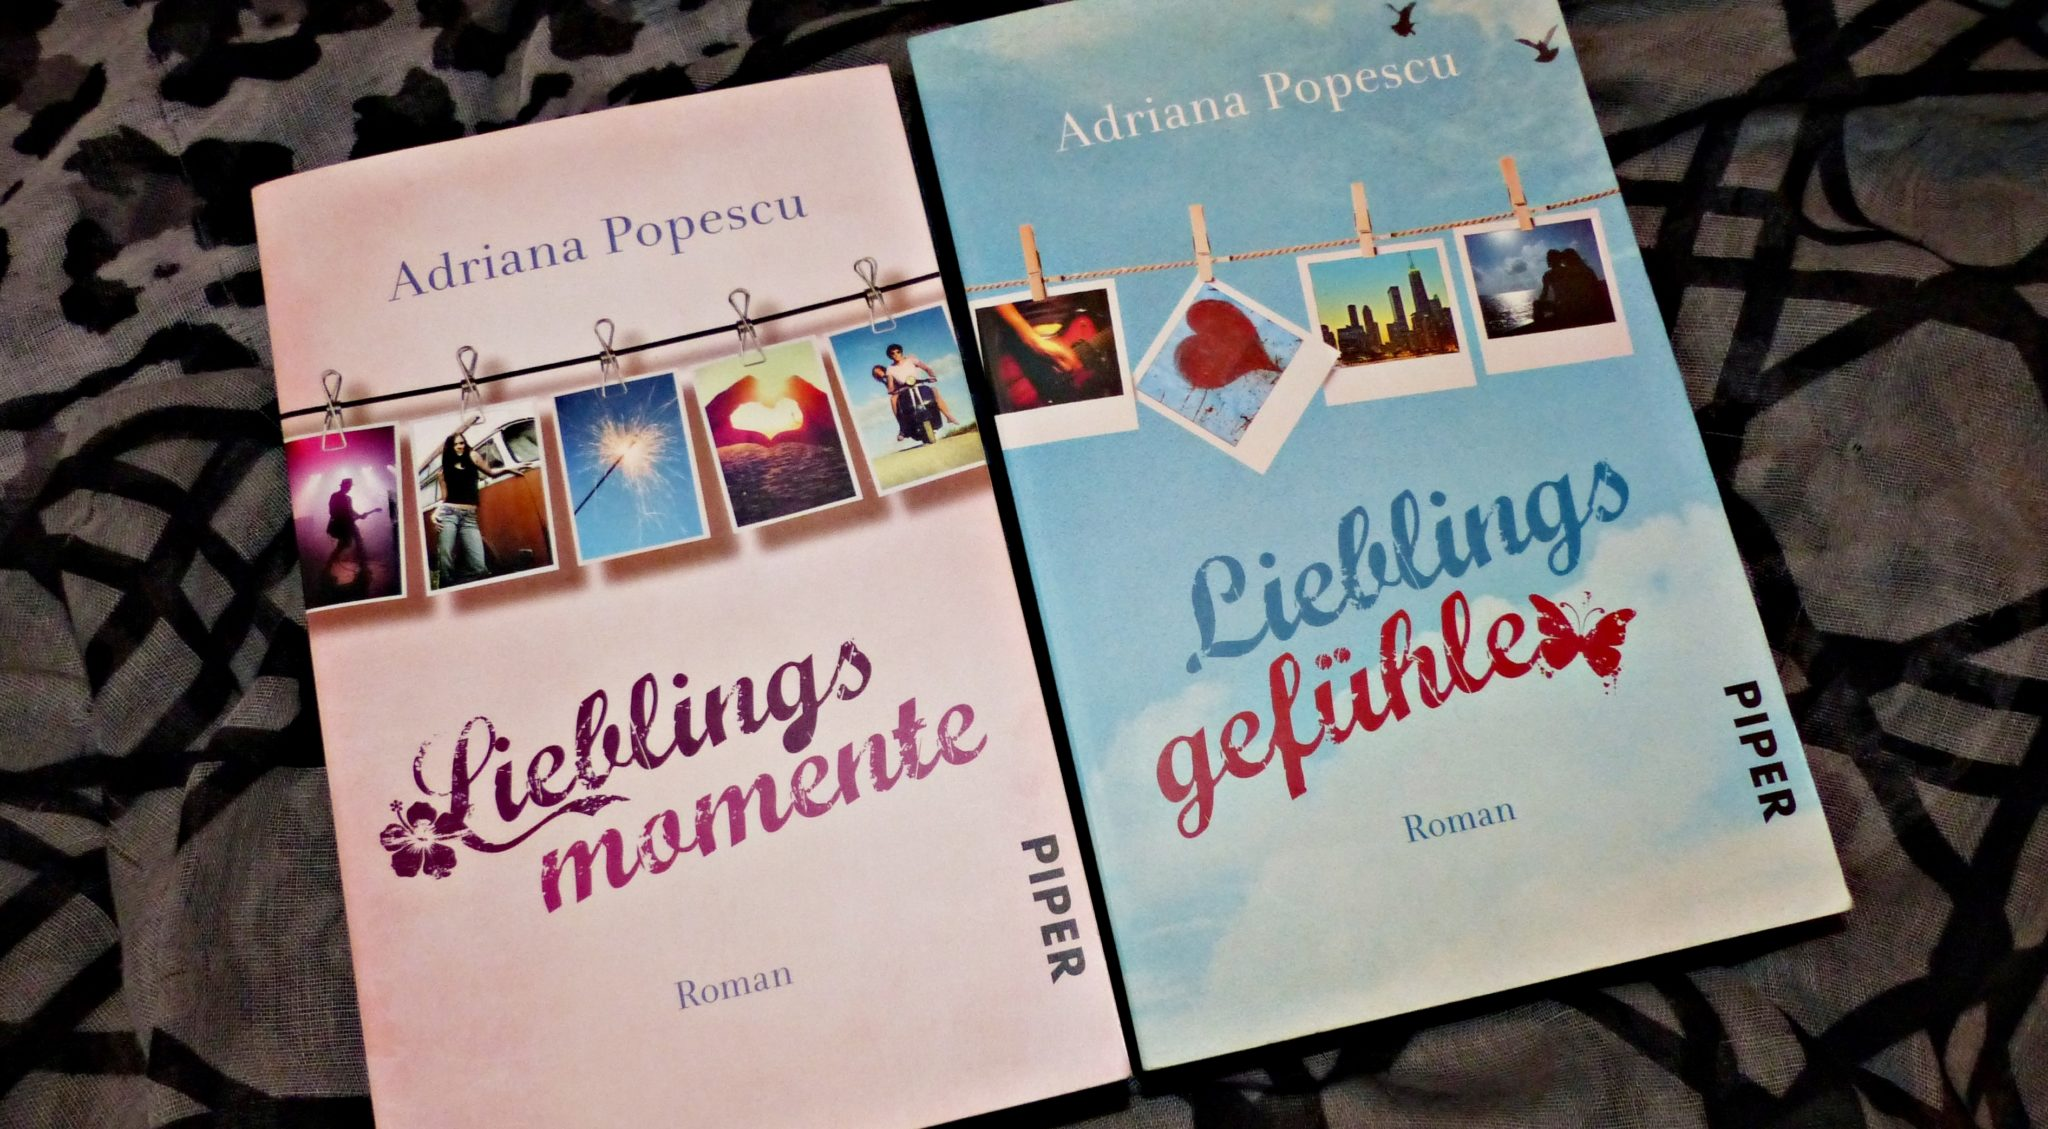 Buchreihe   Lieblingsmomente-Reihe von Adriana Popescu